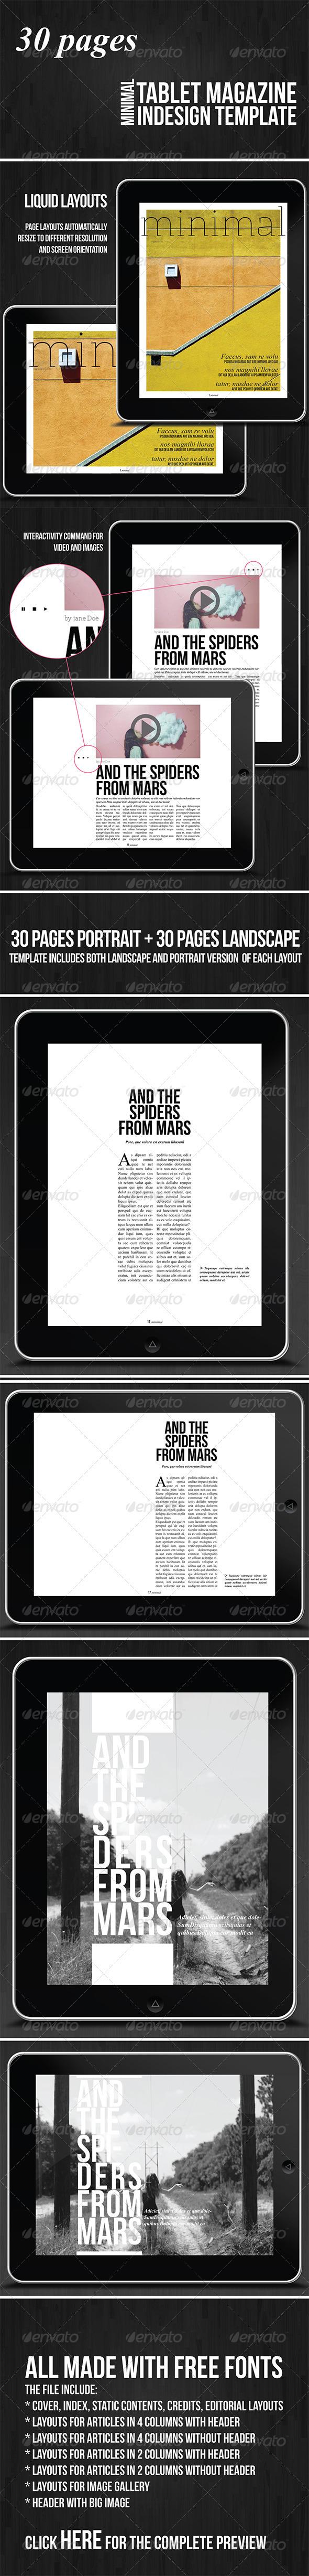 tablet magazine